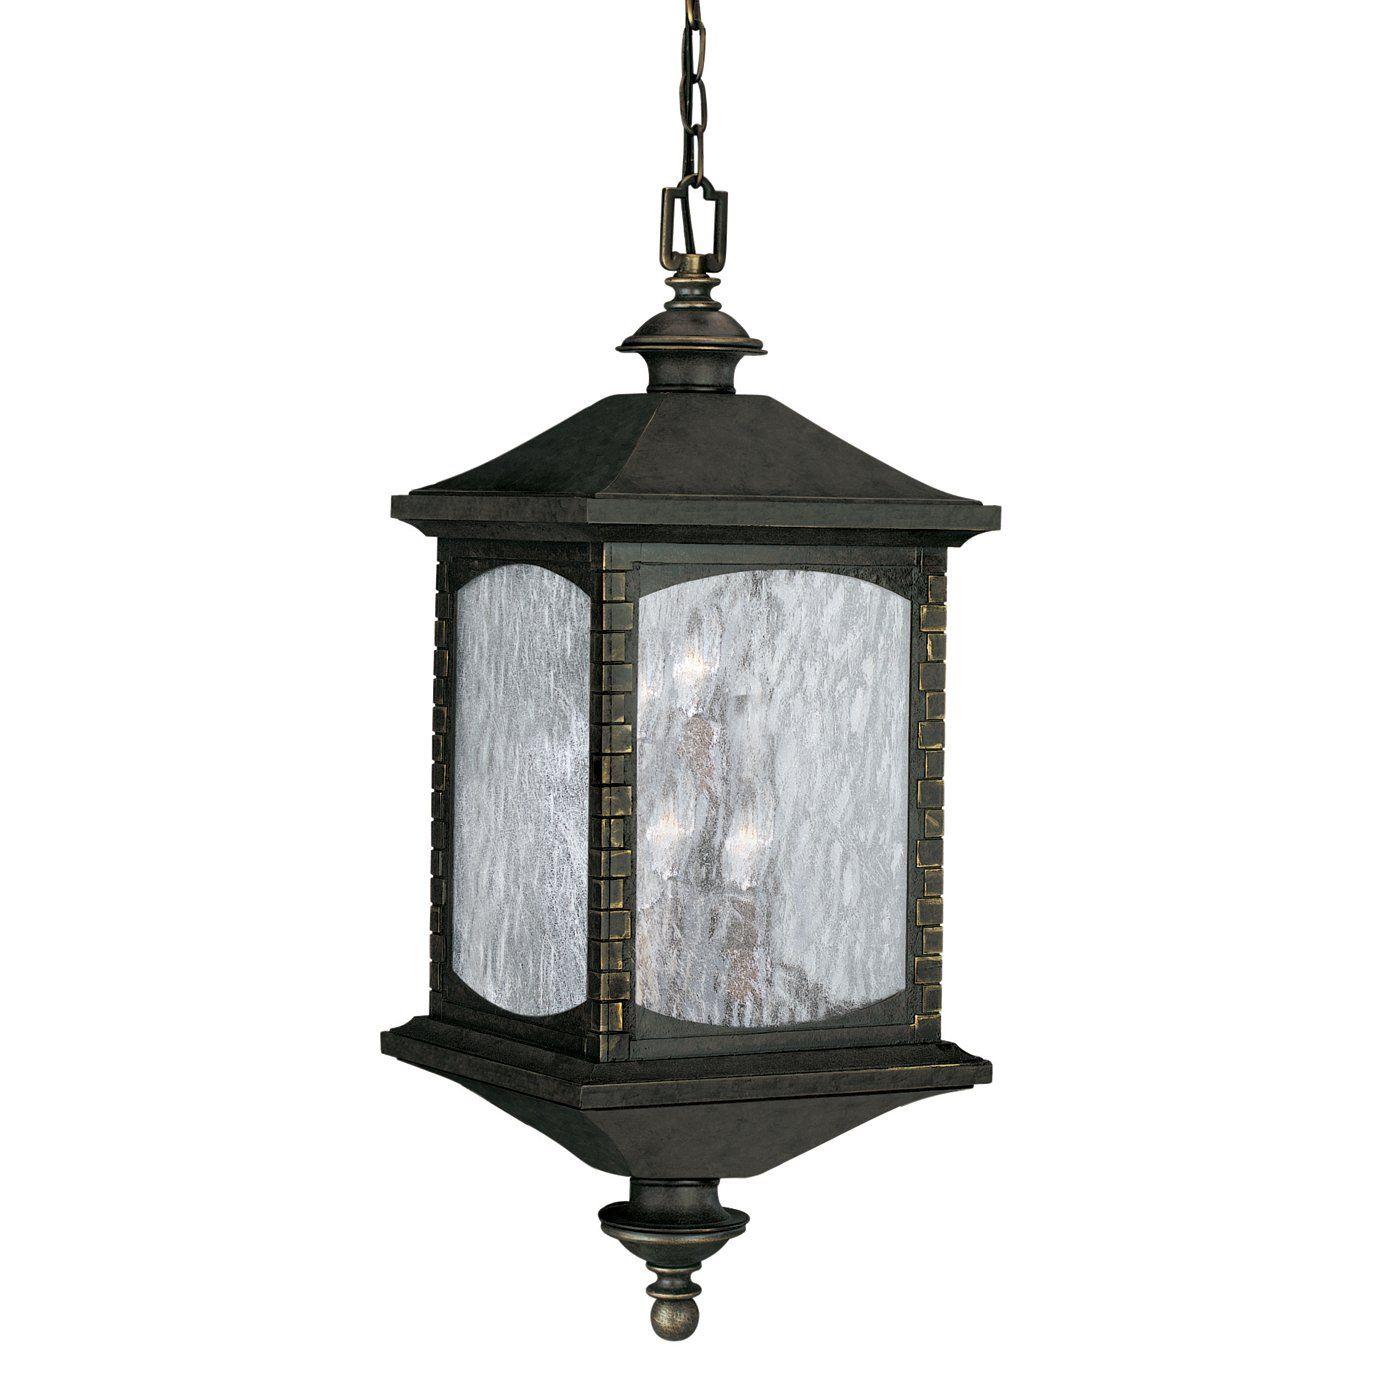 Thomas Lighting M5405 40 6 Light Tudor Row Outdoor Pendant